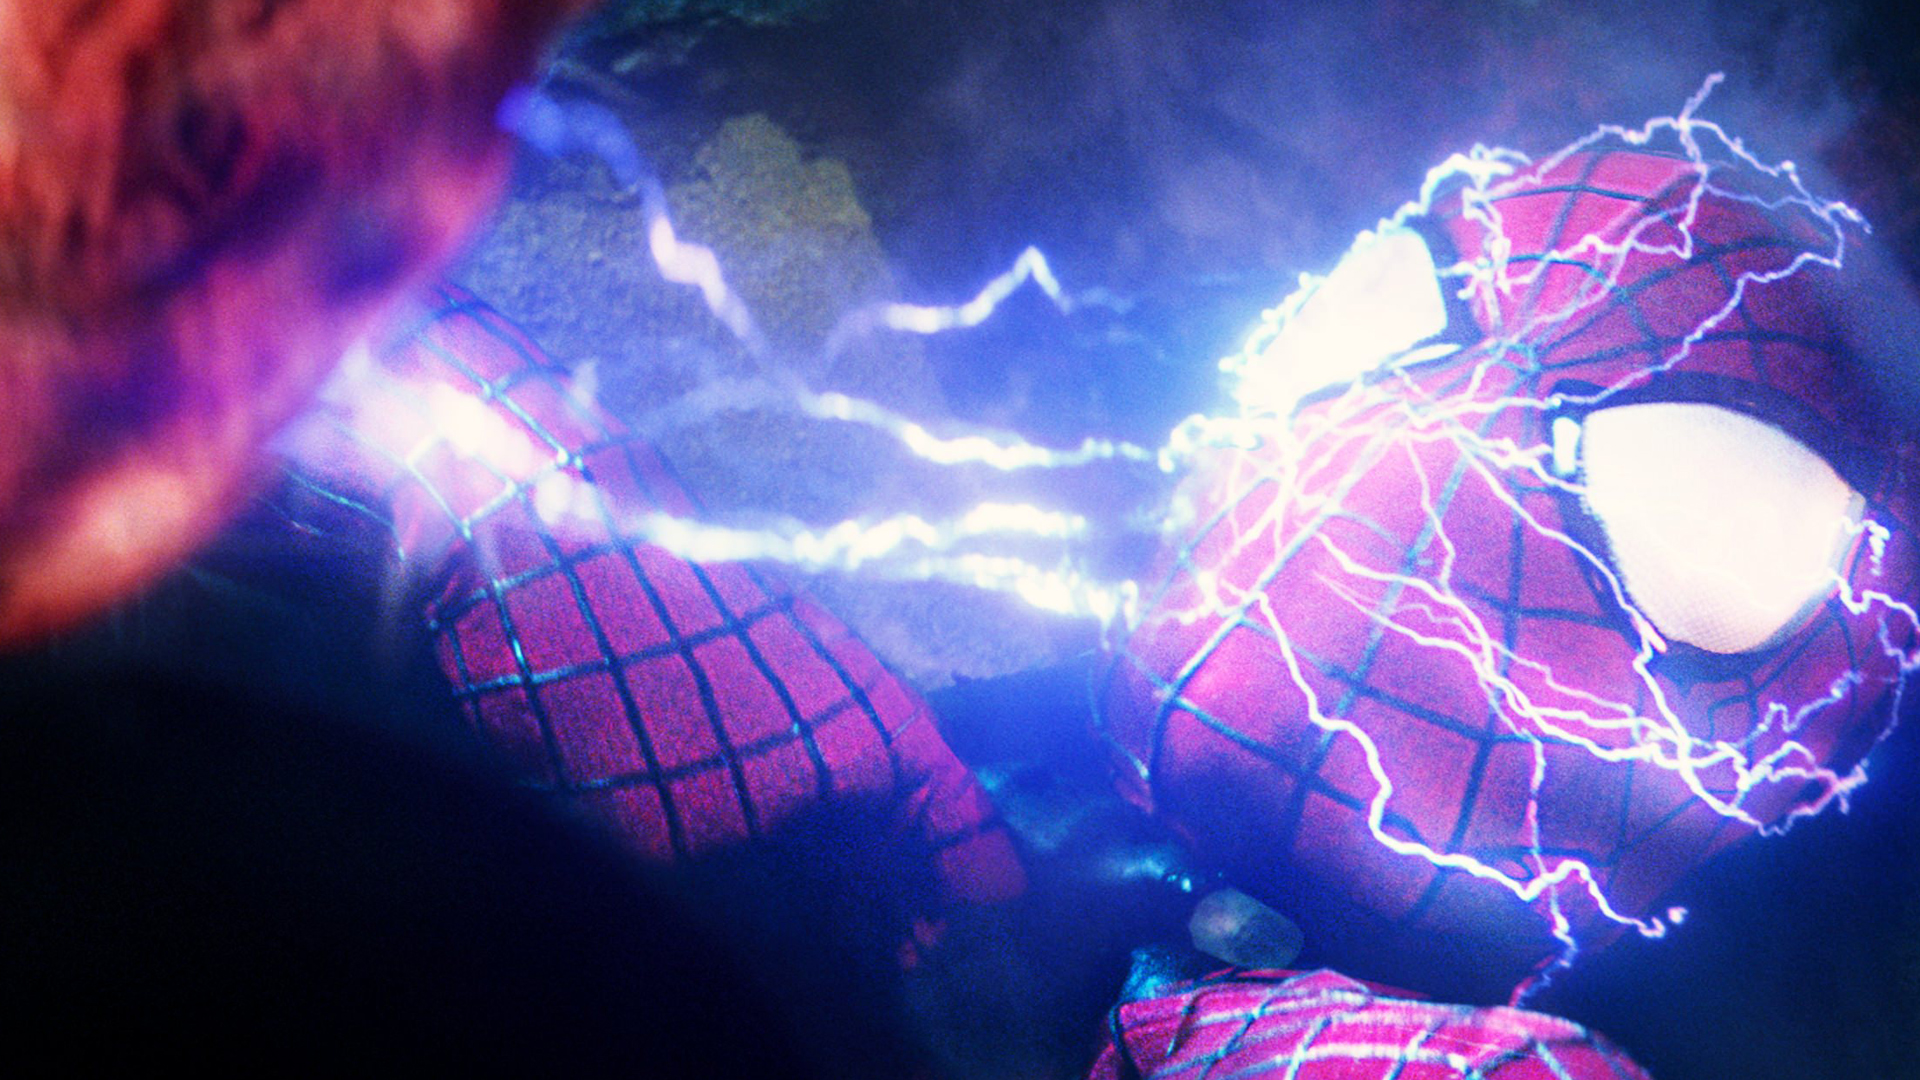 Electro Spider Man Wallpaper Electro vs Spider Man ...